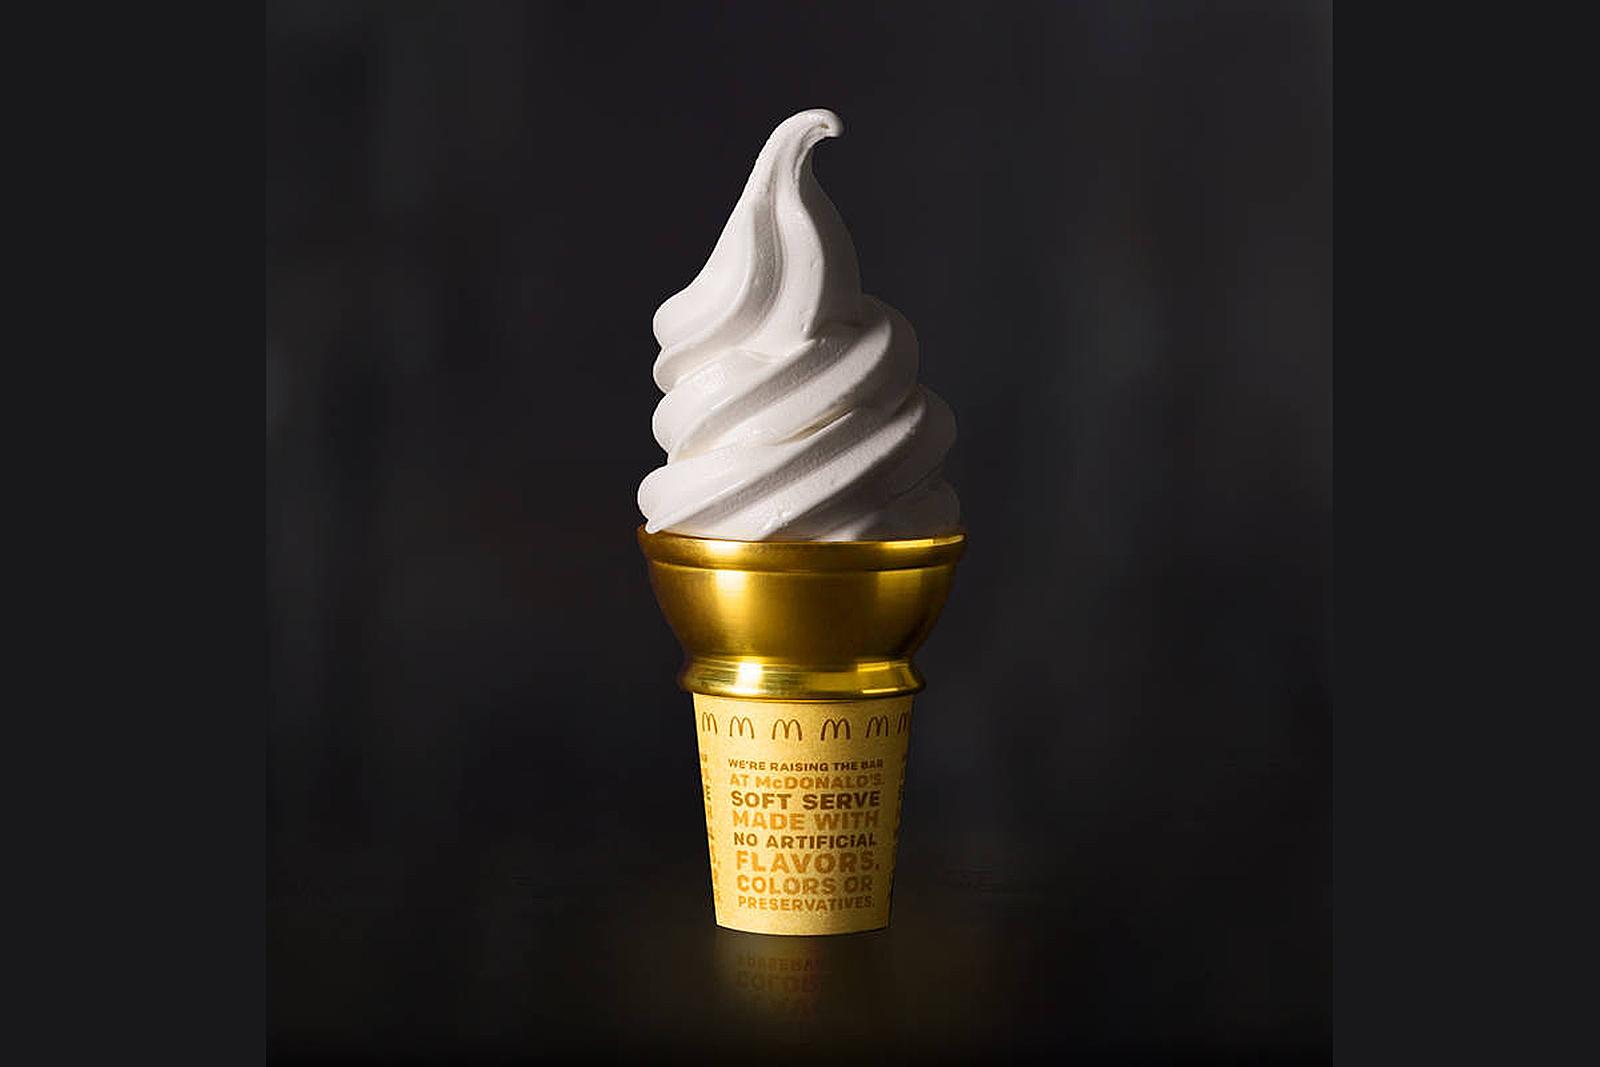 McDonald's Golden Cone